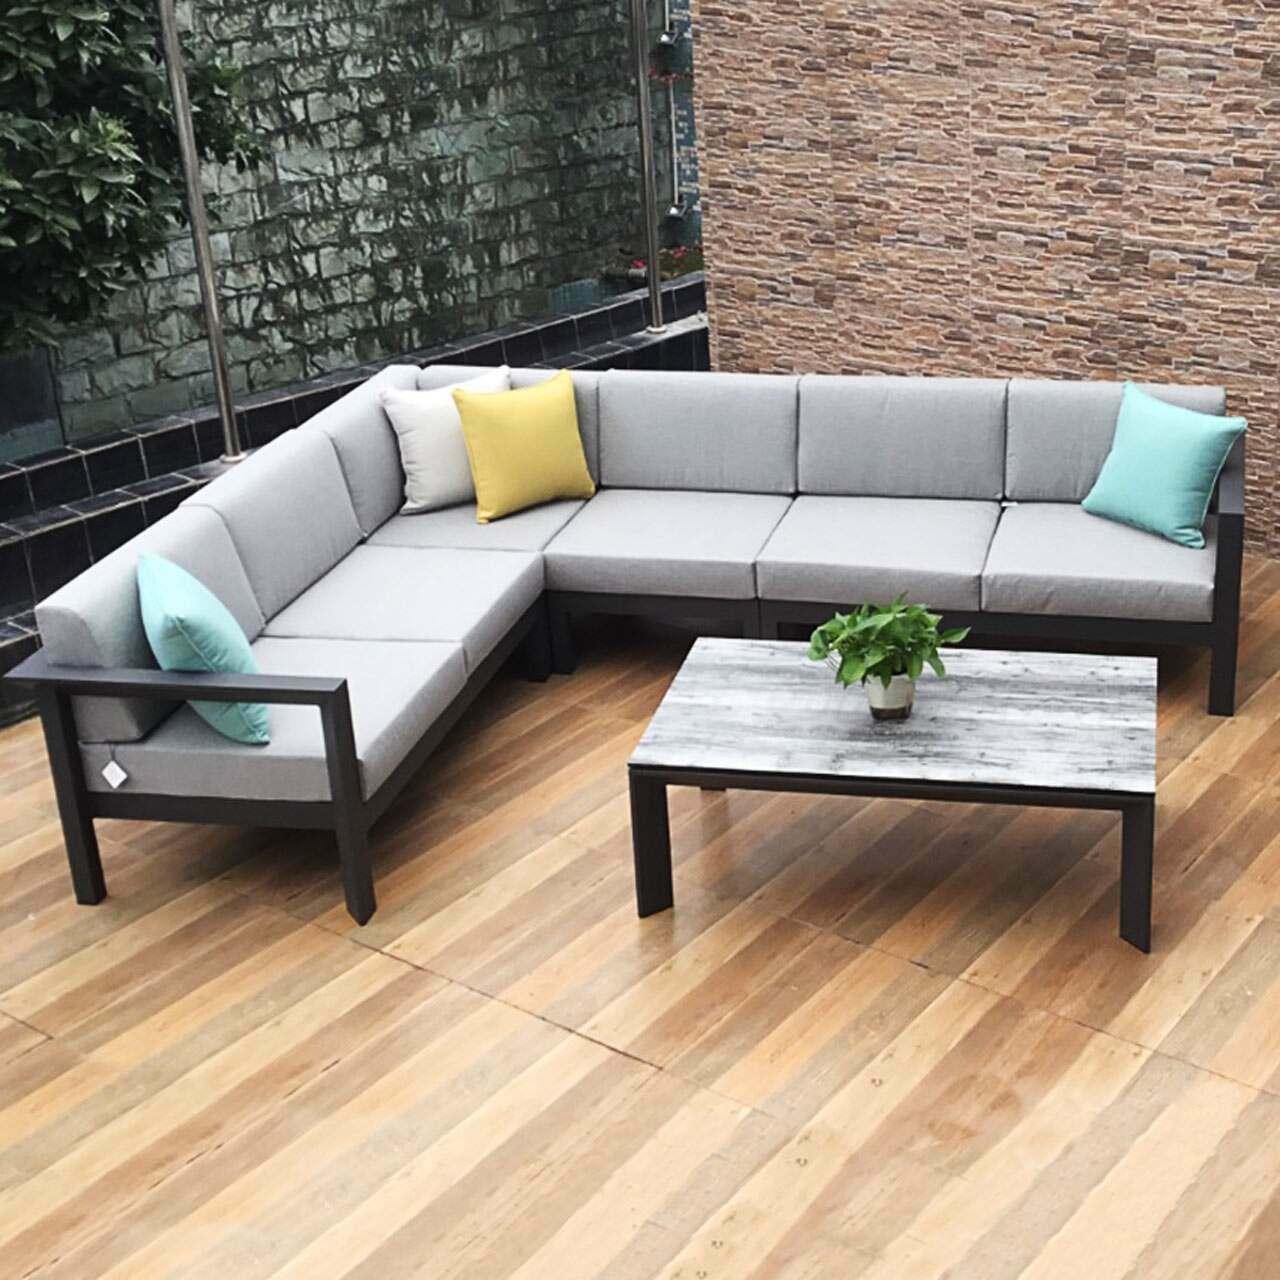 Harrier Luxury Garden Corner Sofa & Table Set